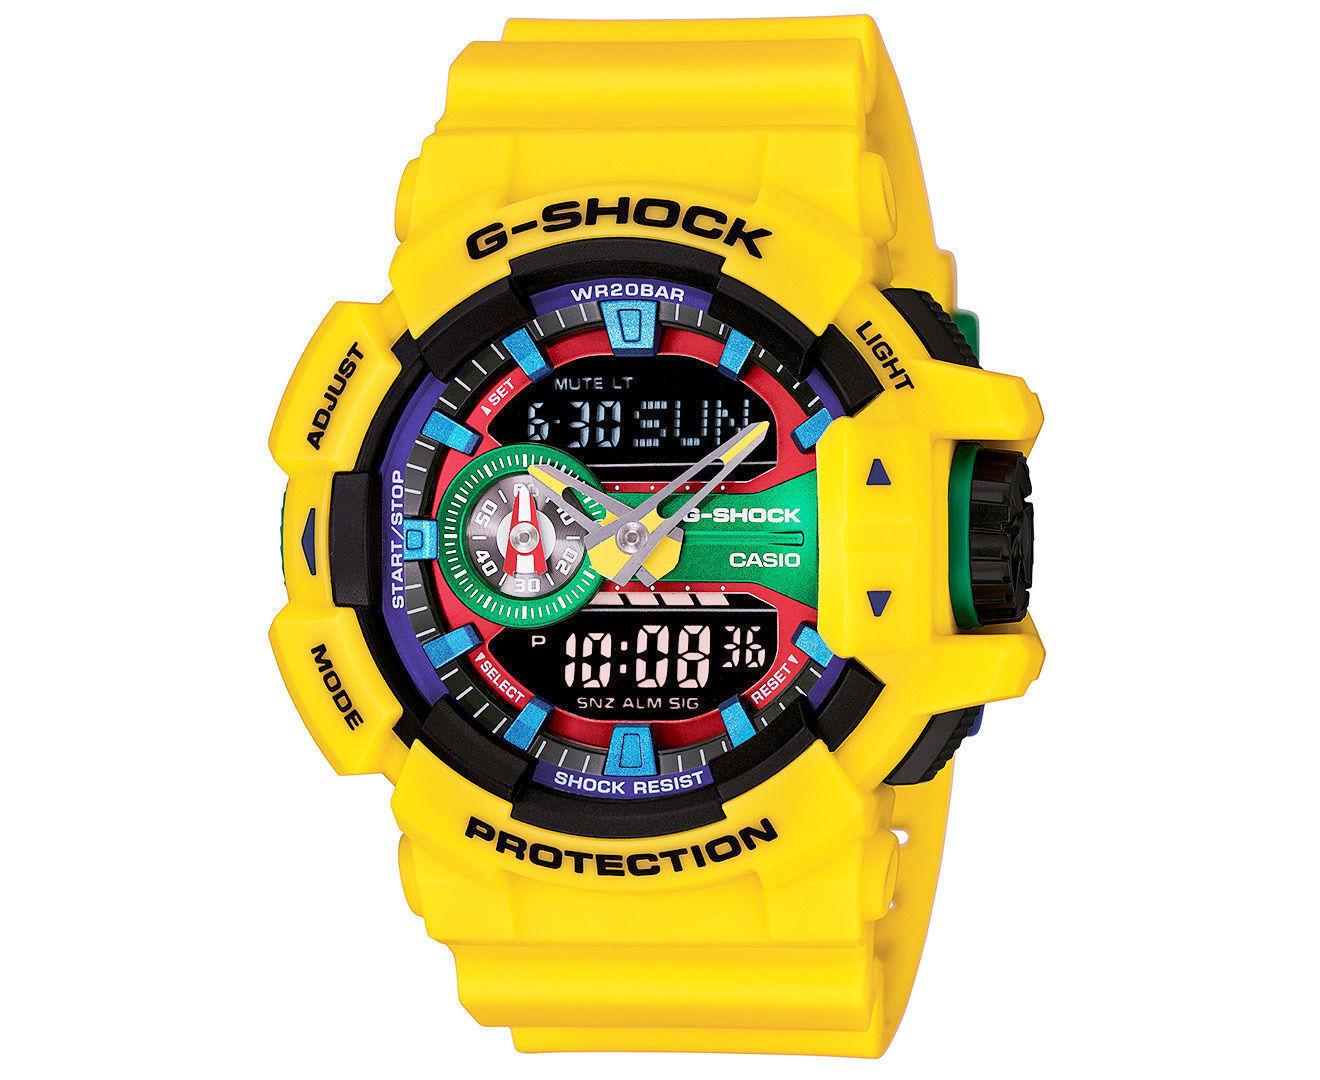 Casio Analog Digital Sport Mens G Shock Yellow Watch Ga 400 9a Ebay Gac 110 1adr Stock Photo